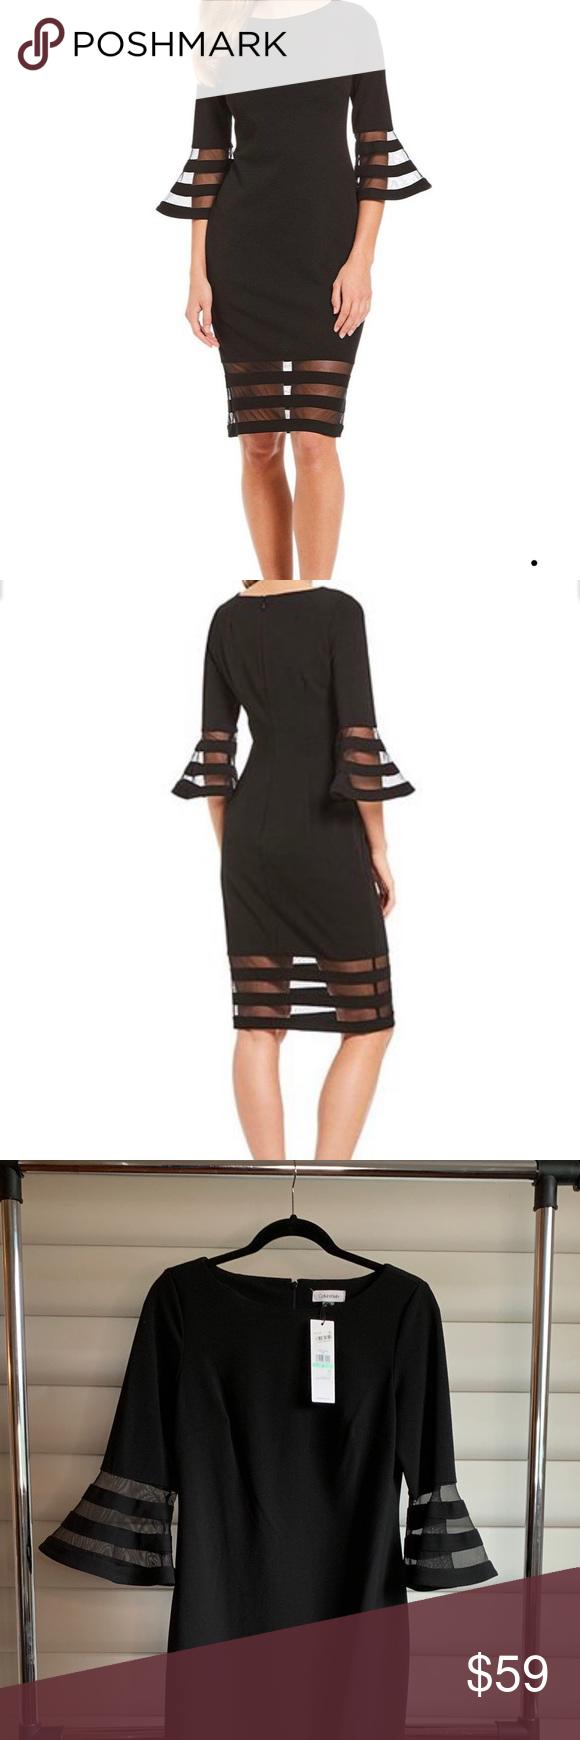 42+ Calvin klein illusion bell sleeve dress inspirations